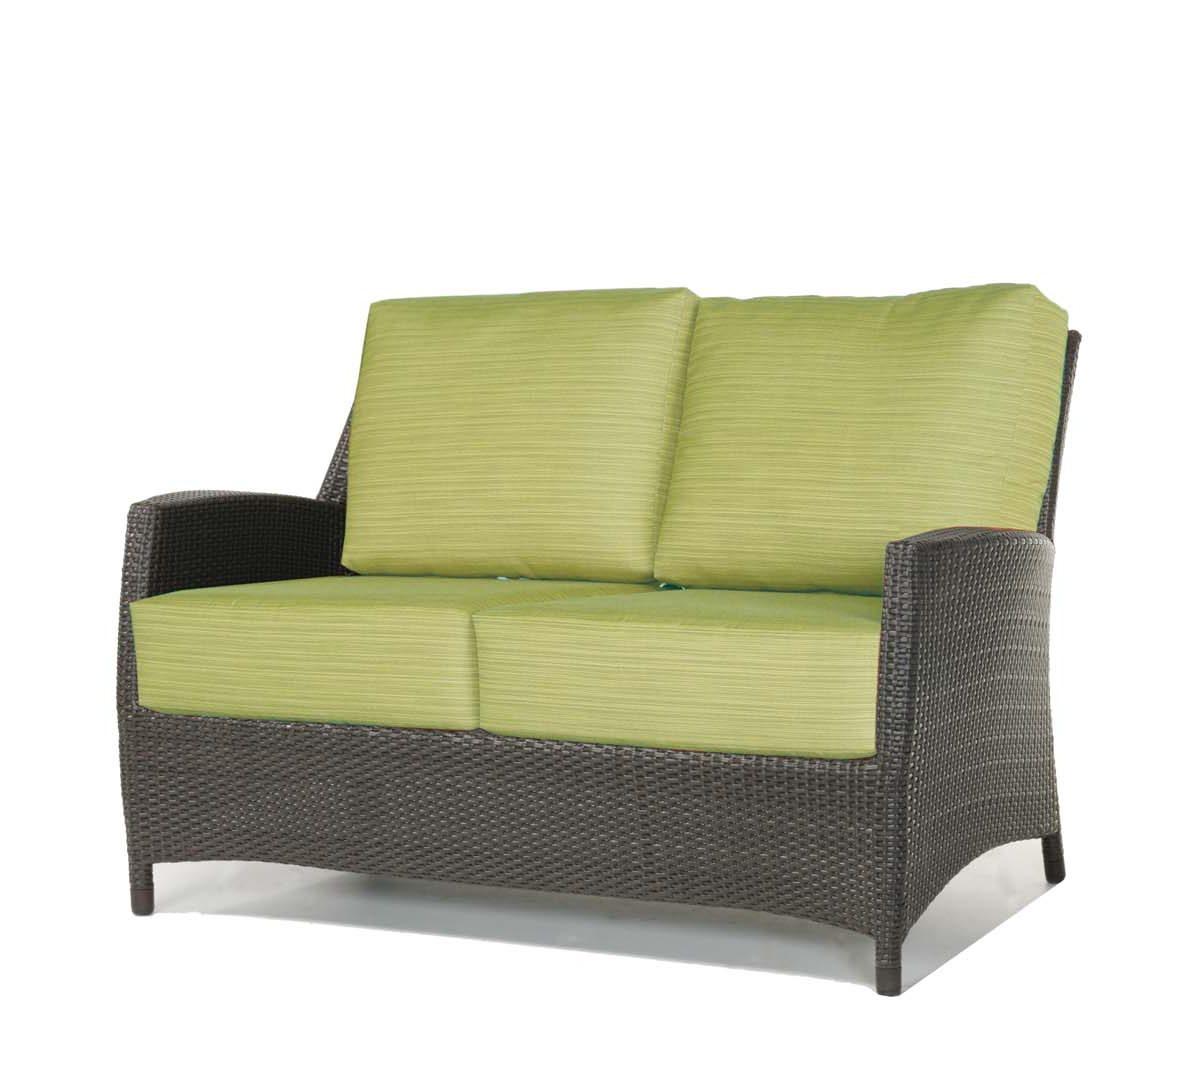 Palm Harbor loveseat Ratana in espresso frame & green striped cushions.